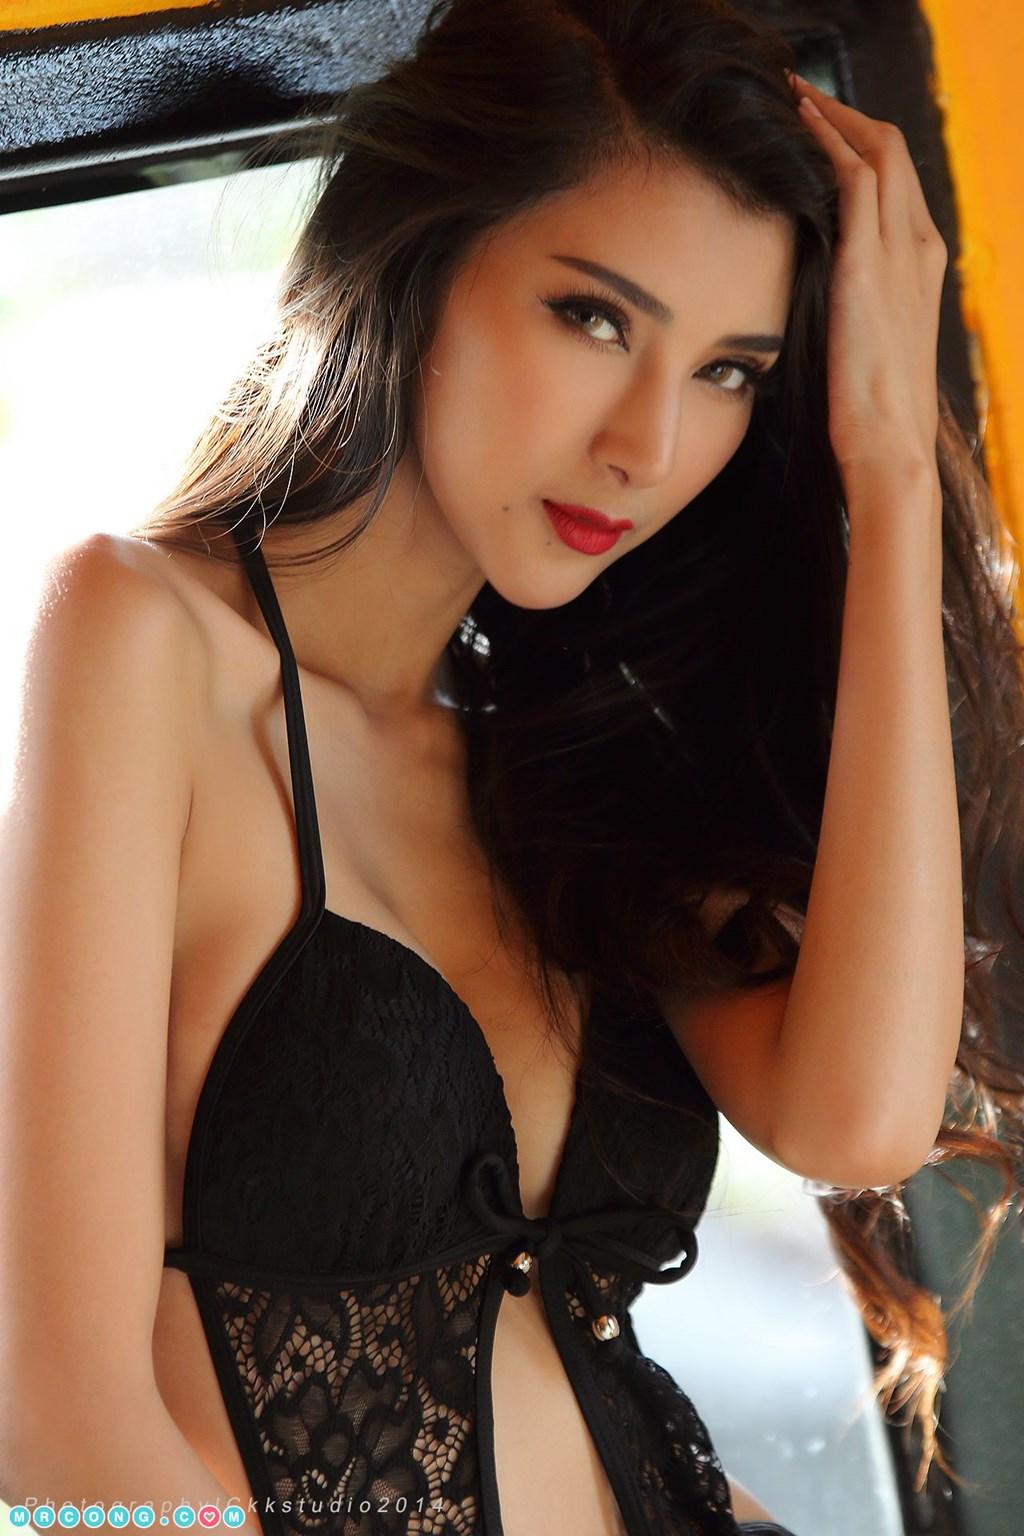 Image Thai-Model-No.345-Takky-Chonticha-Sujitalom-MrCong.com-008 in post Thai Model No.345: Người mẫu Takky Chonticha Sujitalom (27 ảnh)